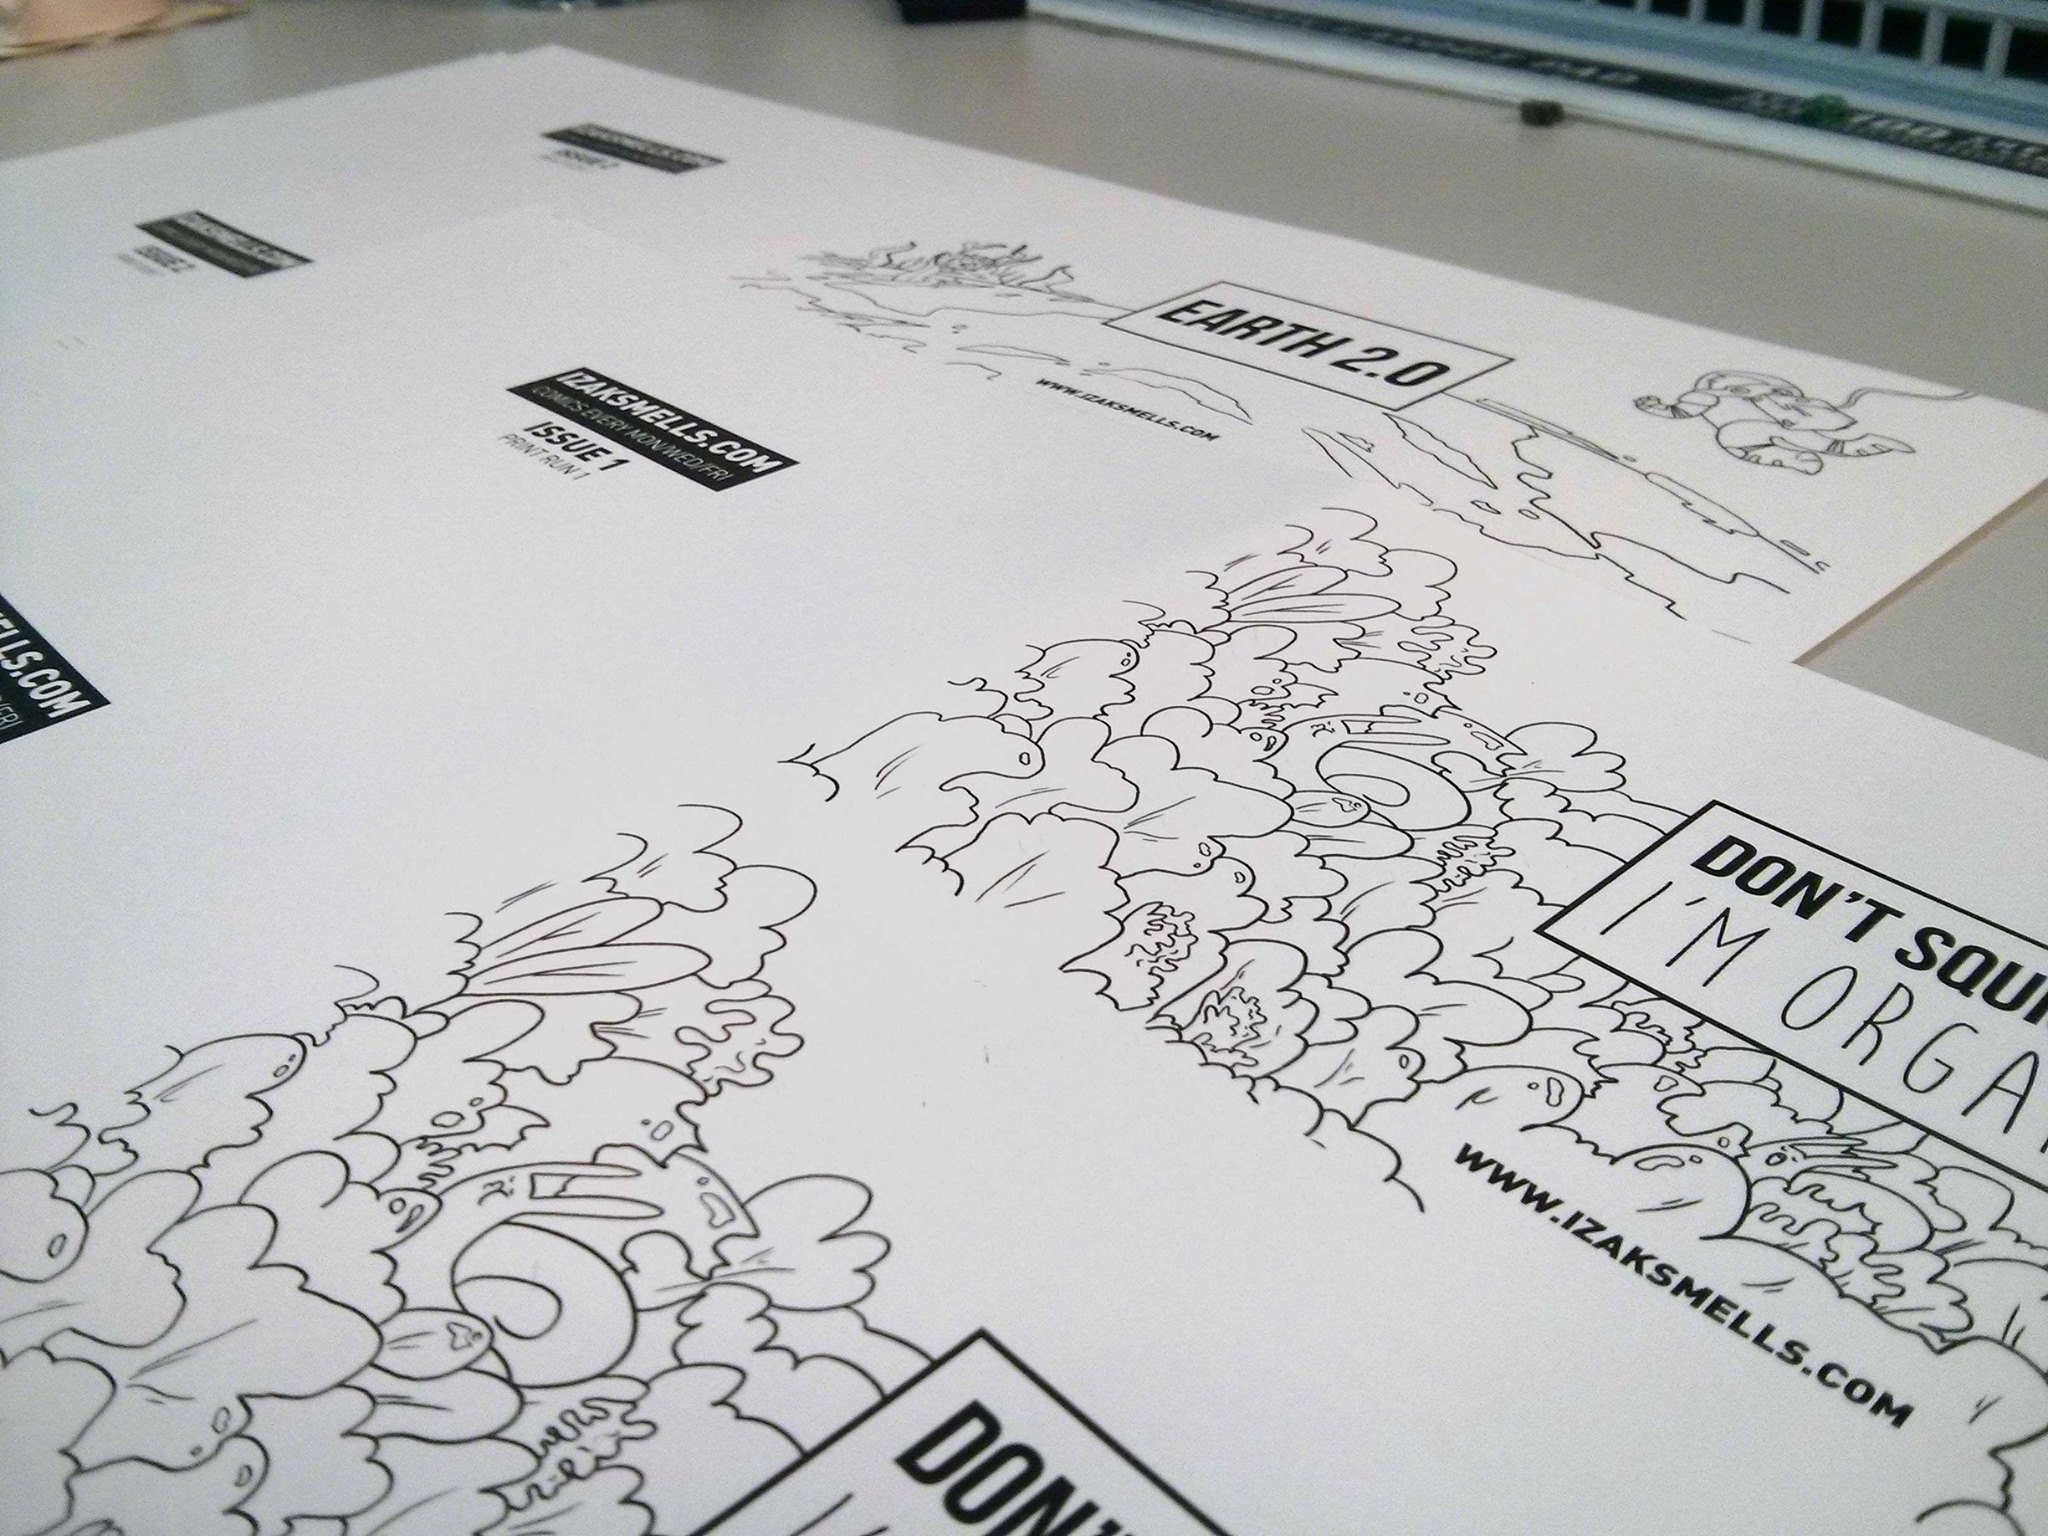 Izak Smells Comic Print out work in progress